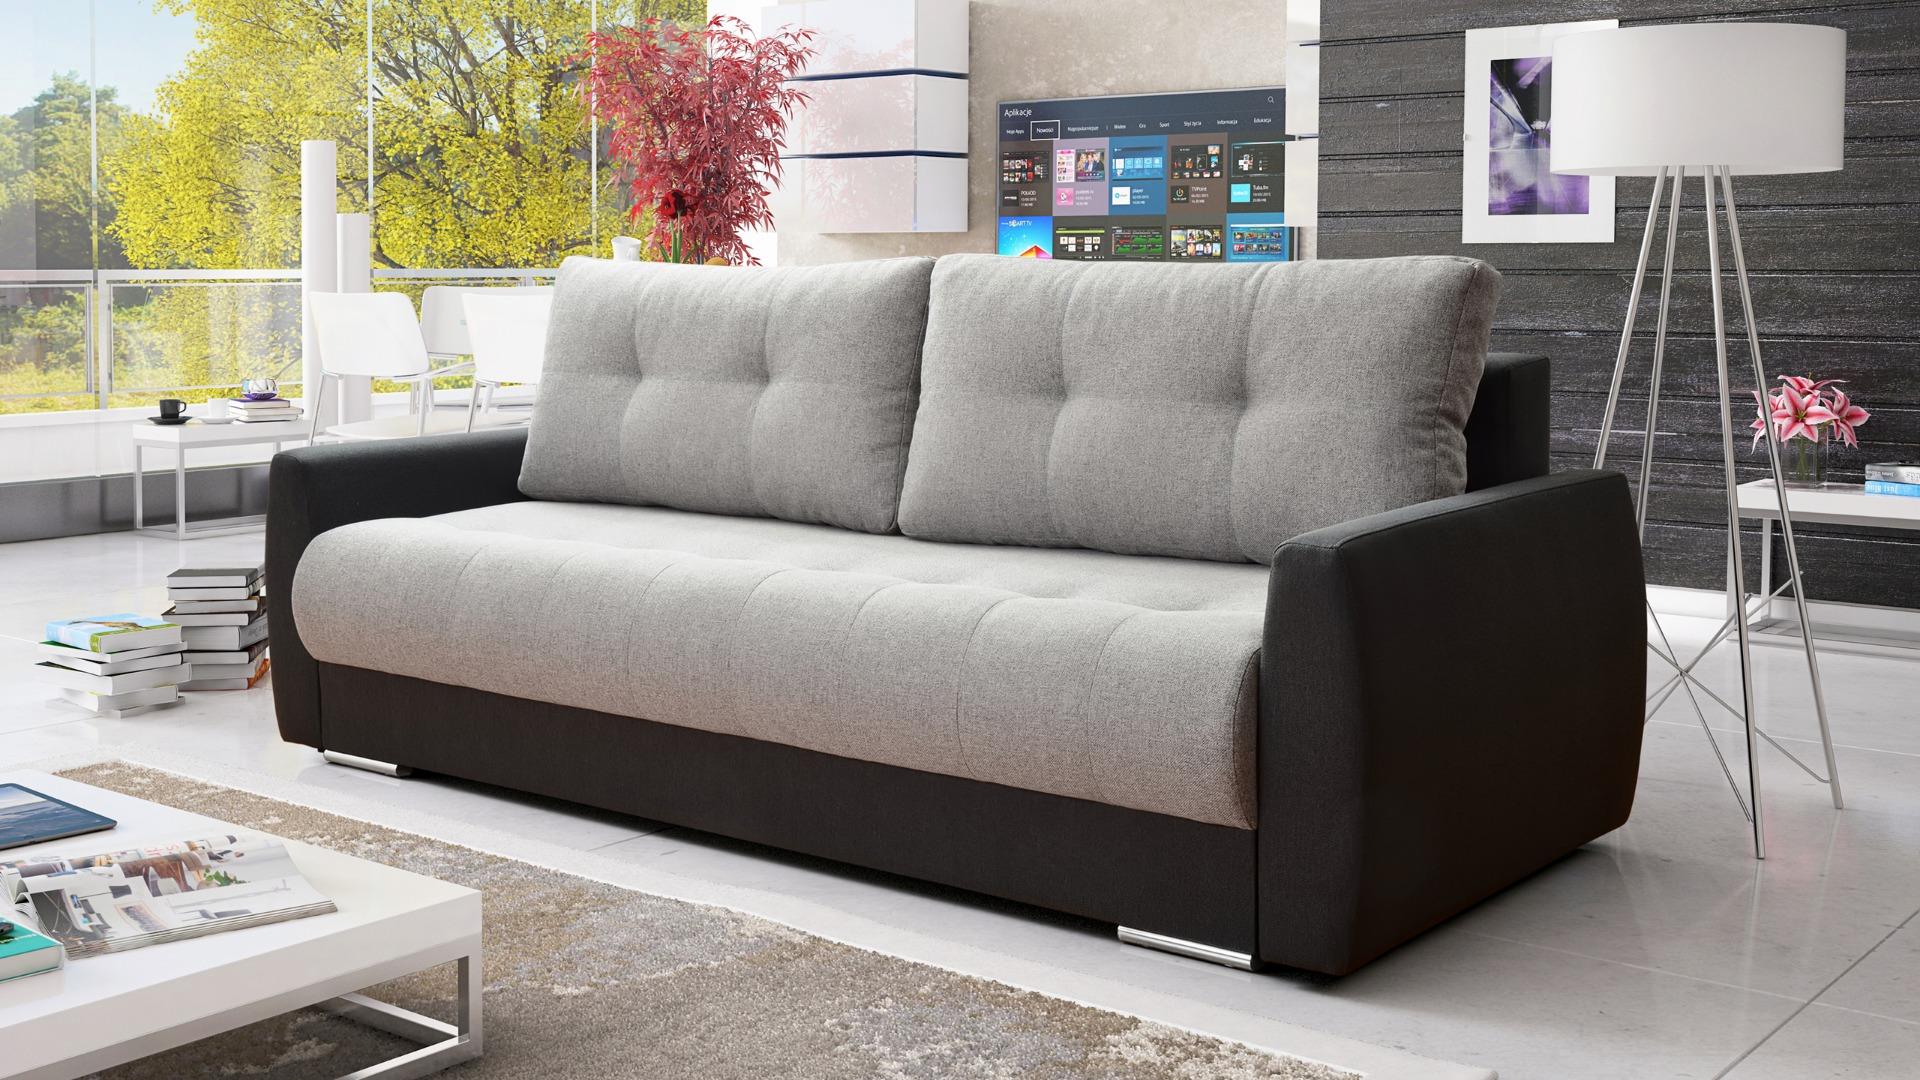 Full Size of Mondo Sofa Relaxfunktion Cognac Lederpflege Online Kaufen Boxspring Mit Schlaffunktion Barock Big Xxl Boxen Dauerschläfer Lagerverkauf Wohnlandschaft Bezug Sofa Mondo Sofa